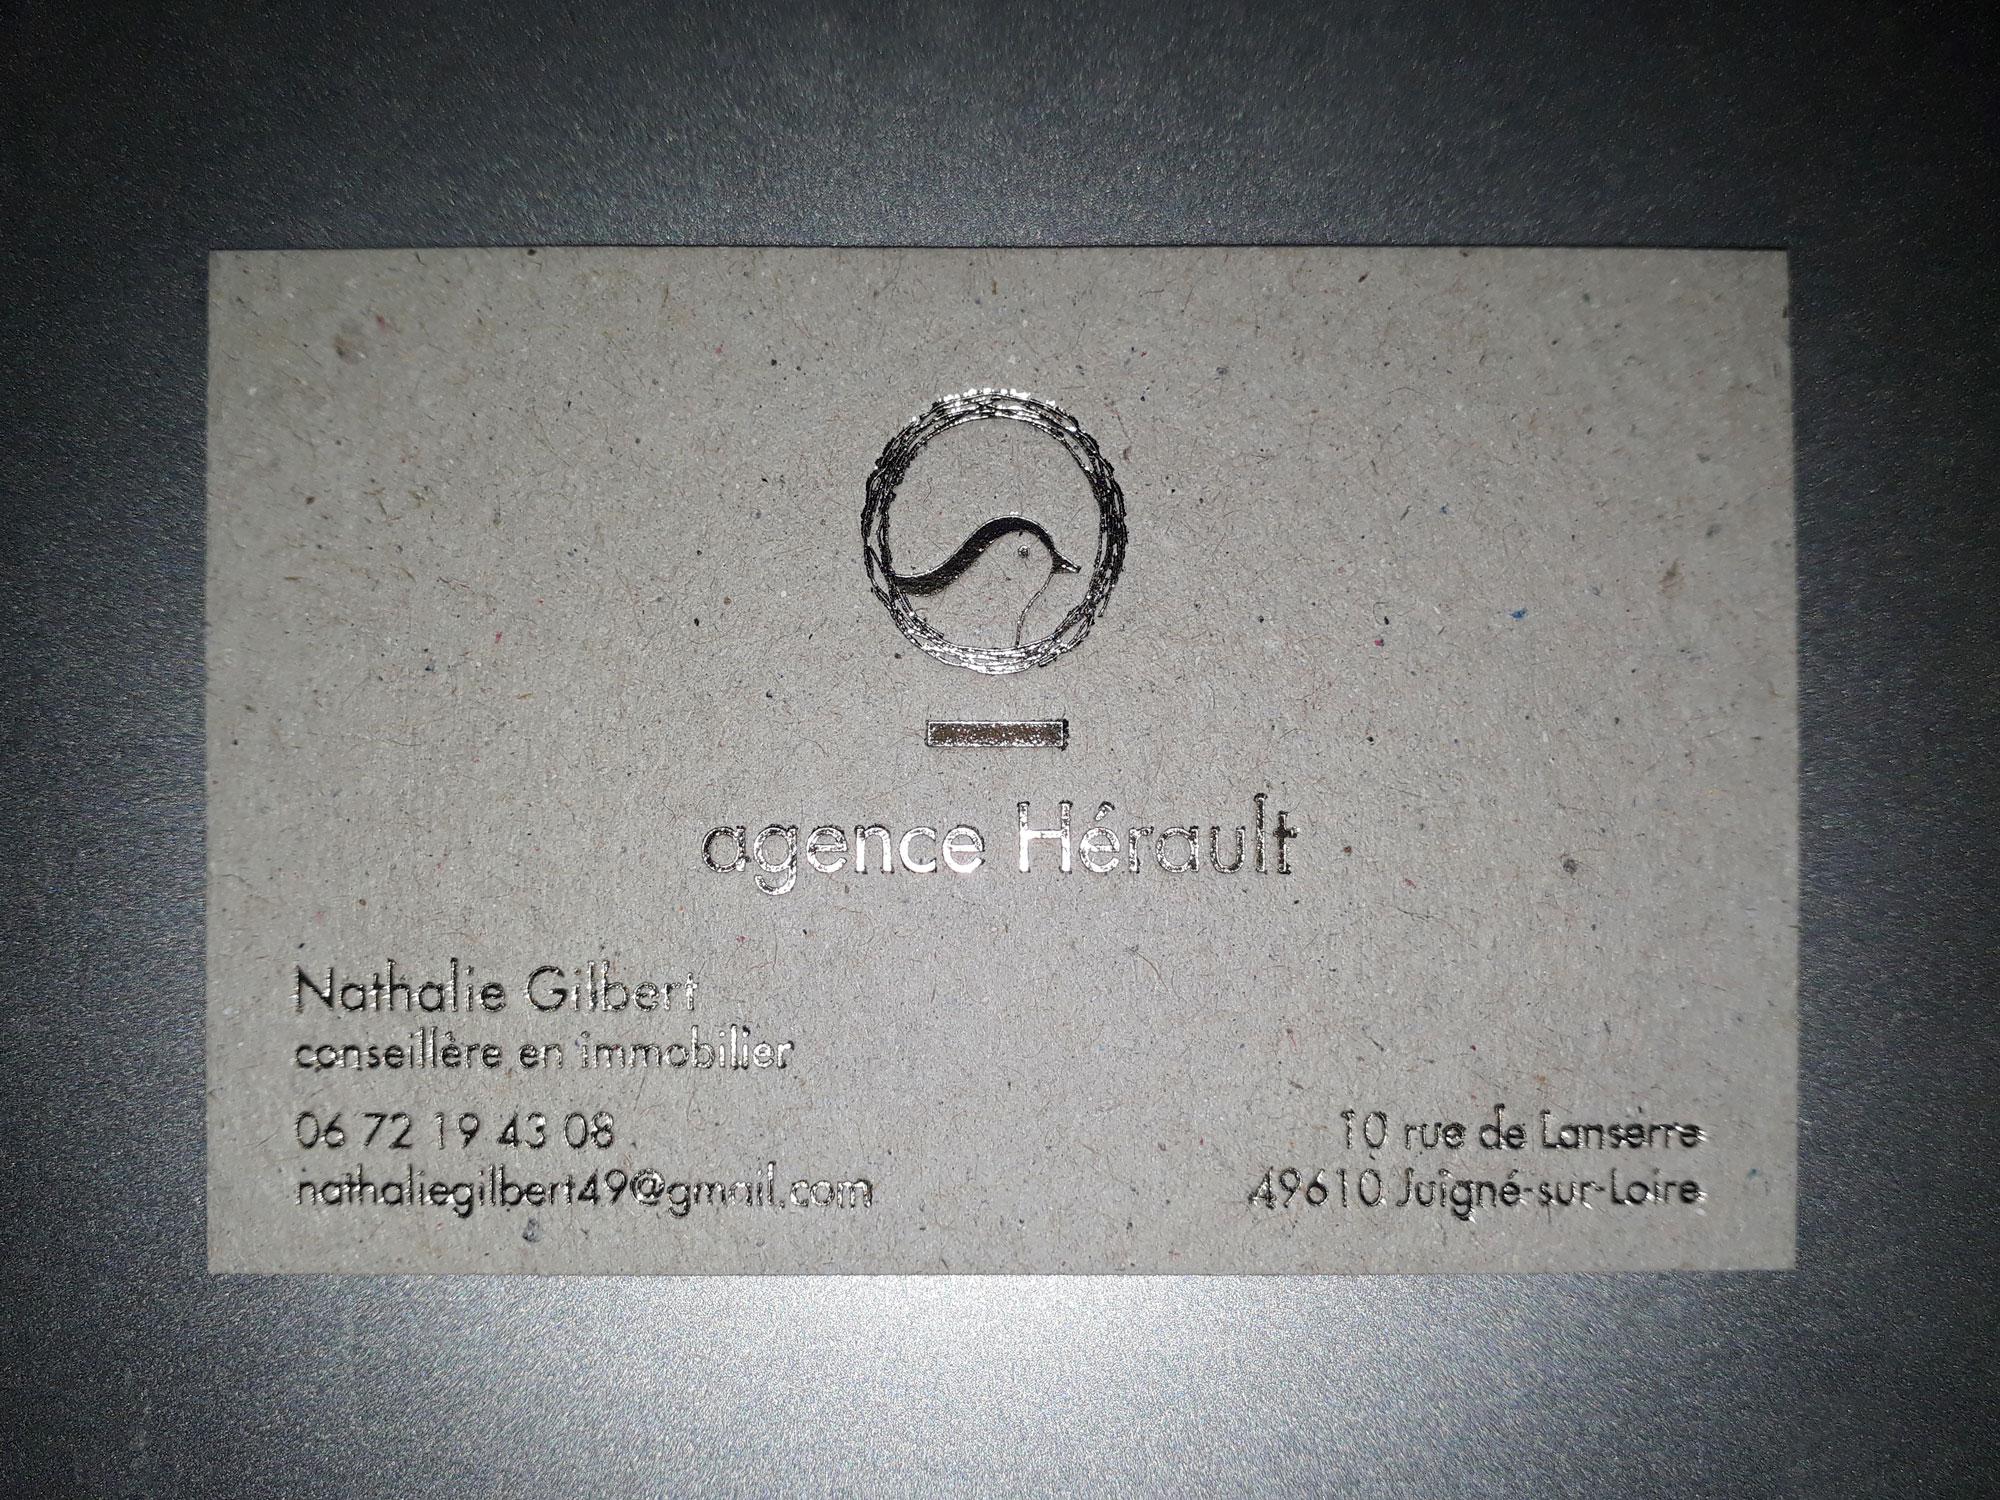 hortense-rossignol-graphiste-angers-carte-de-visite-marquage-a-chaud-or-carton-gris-3